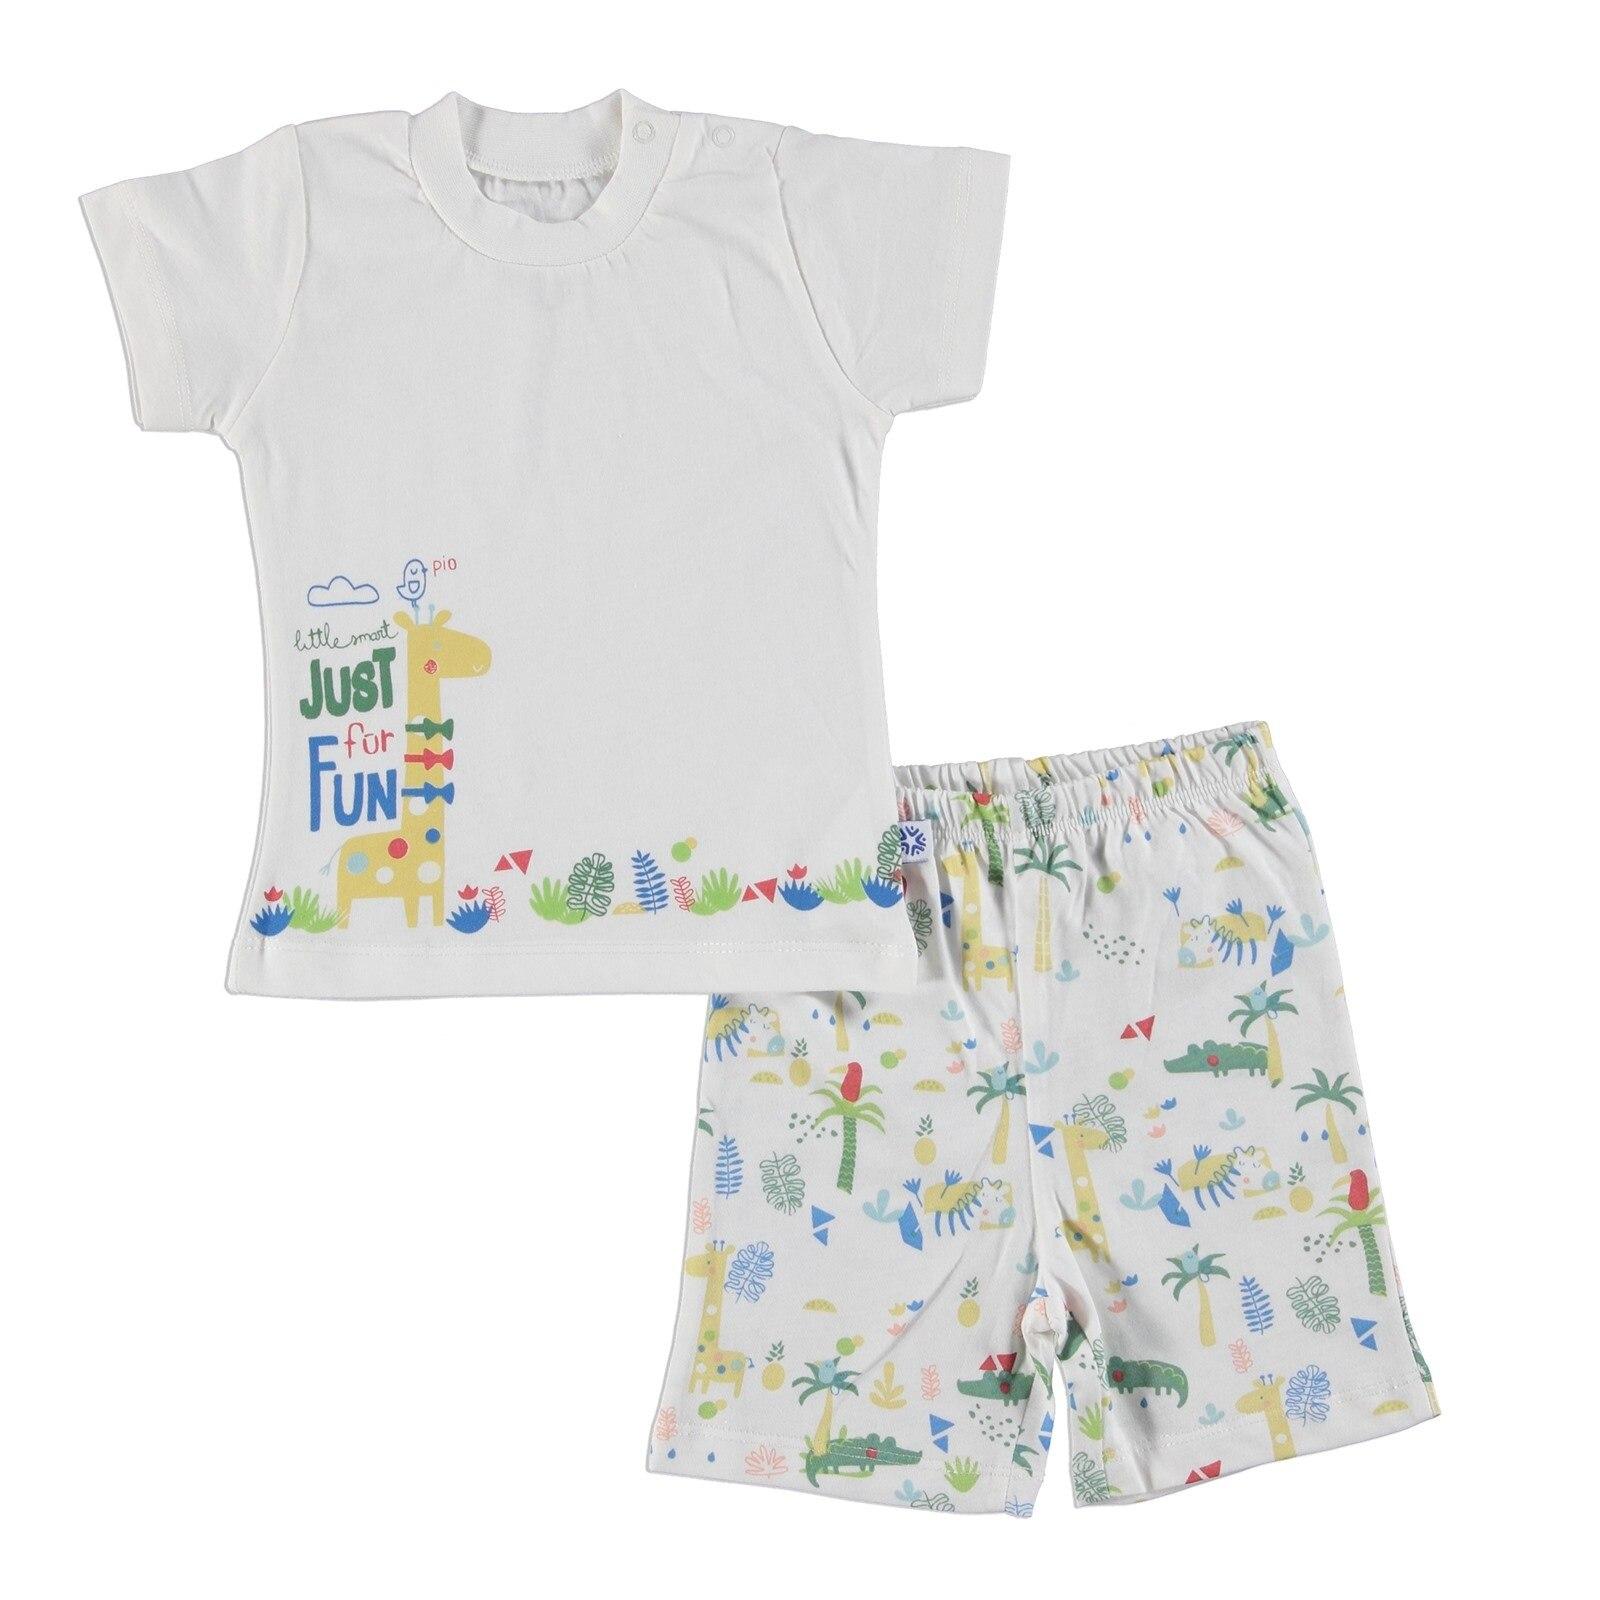 Ebebek Luggi Baby Boy Crocodile Tshirt Shorts Set